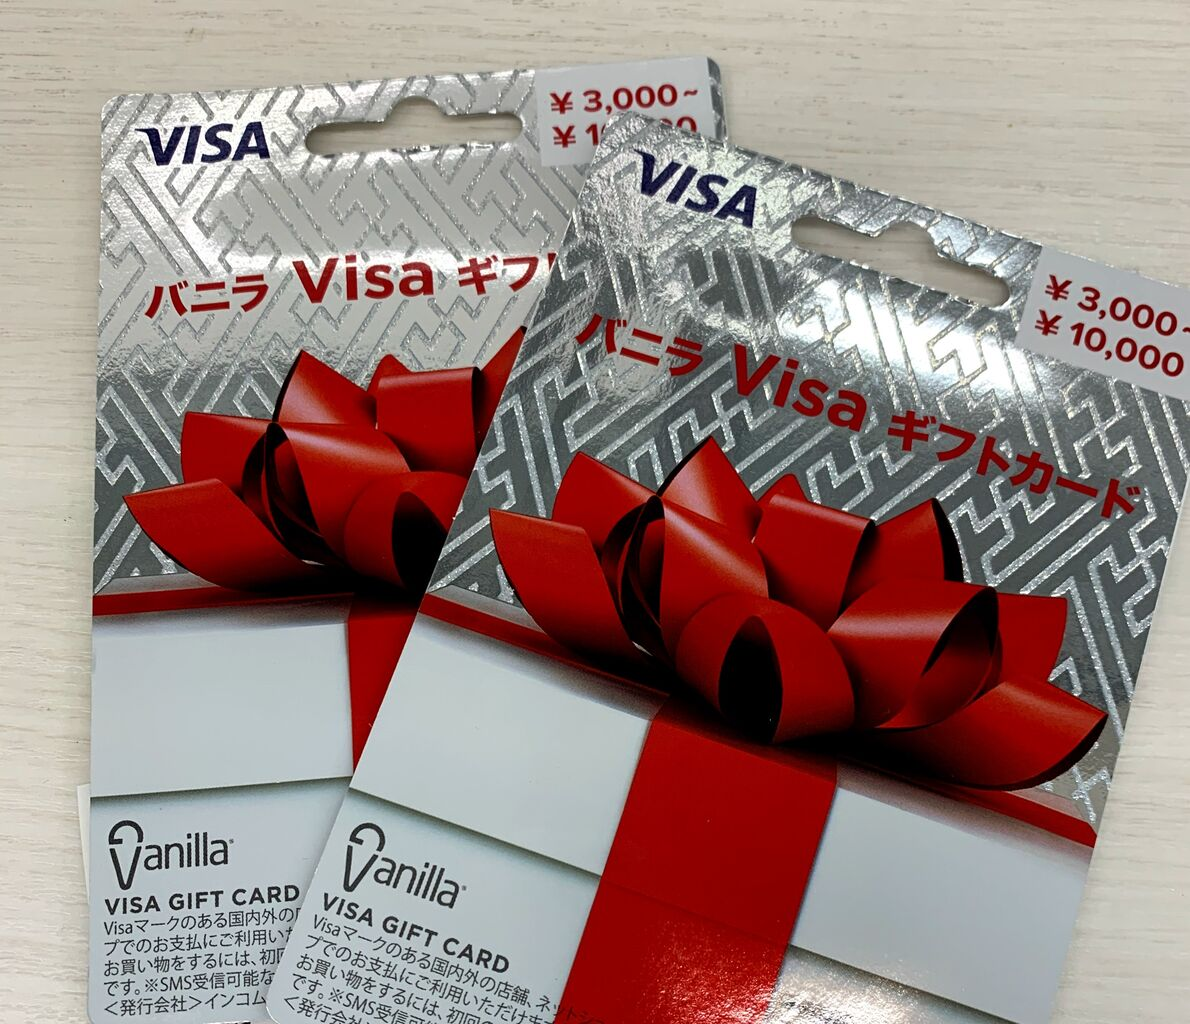 Visa 残高 バニラ 【解説】バニラVISAで残高を使い切るにはAmazonギフト券の購入がおすすめ!